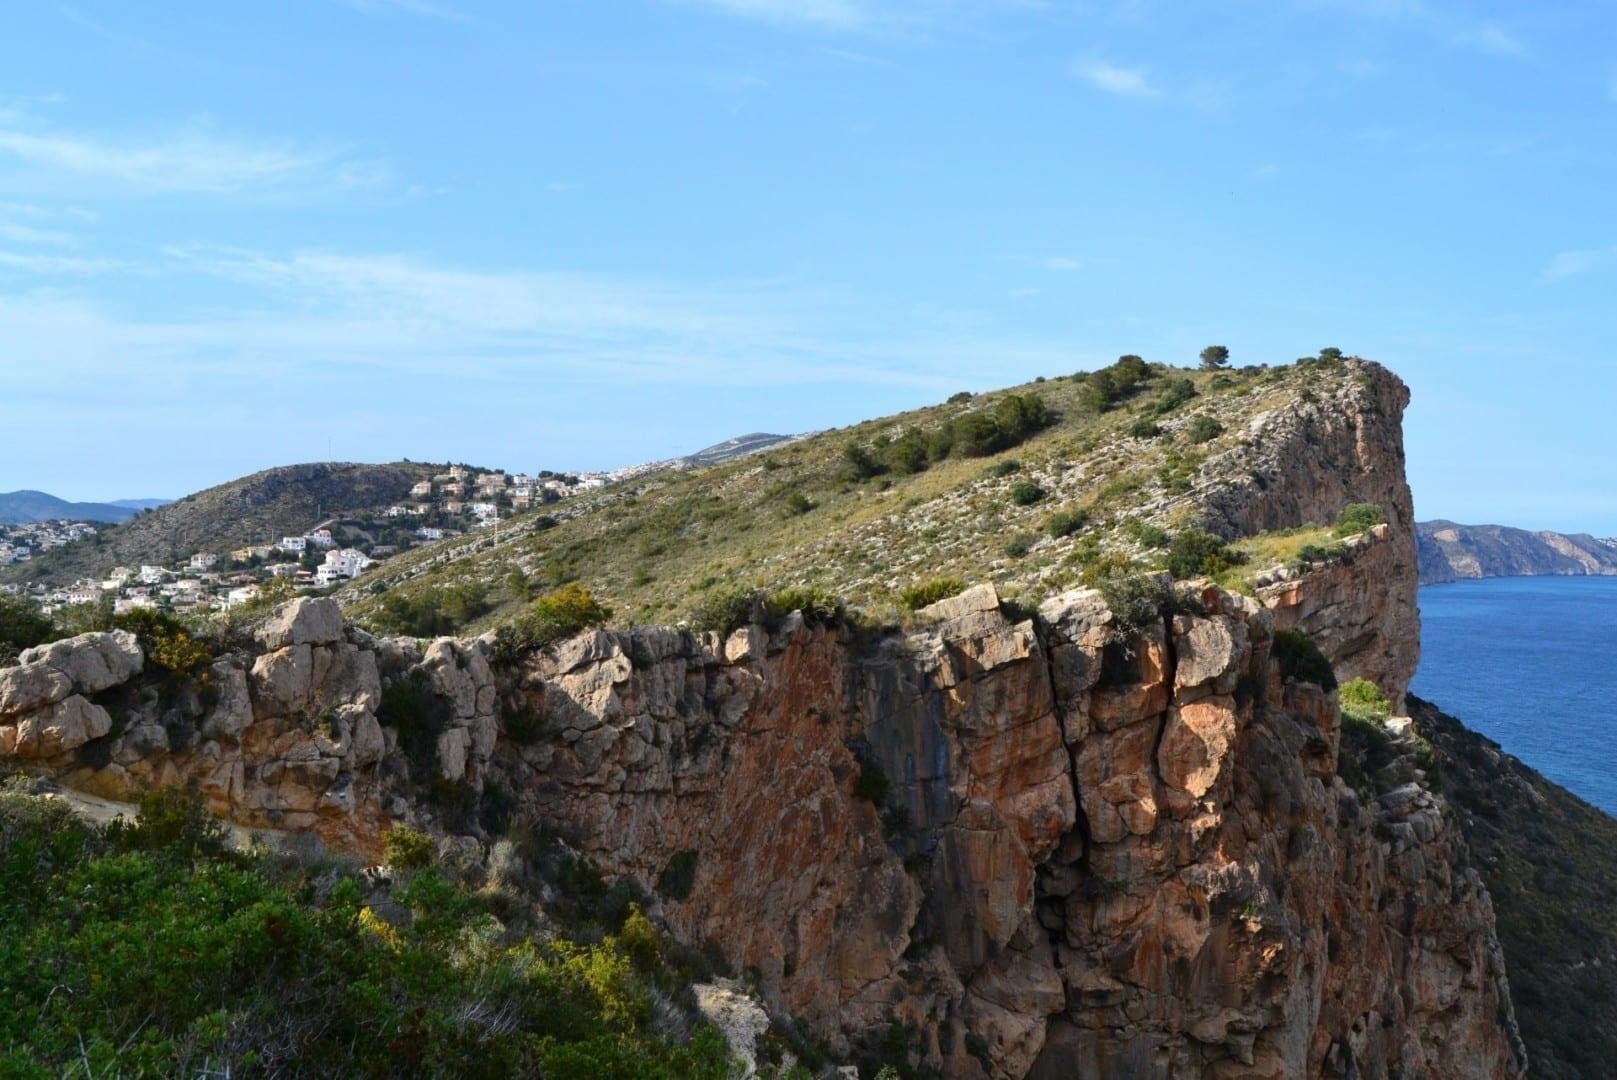 Vista desde el Cap d'Or Moraira España